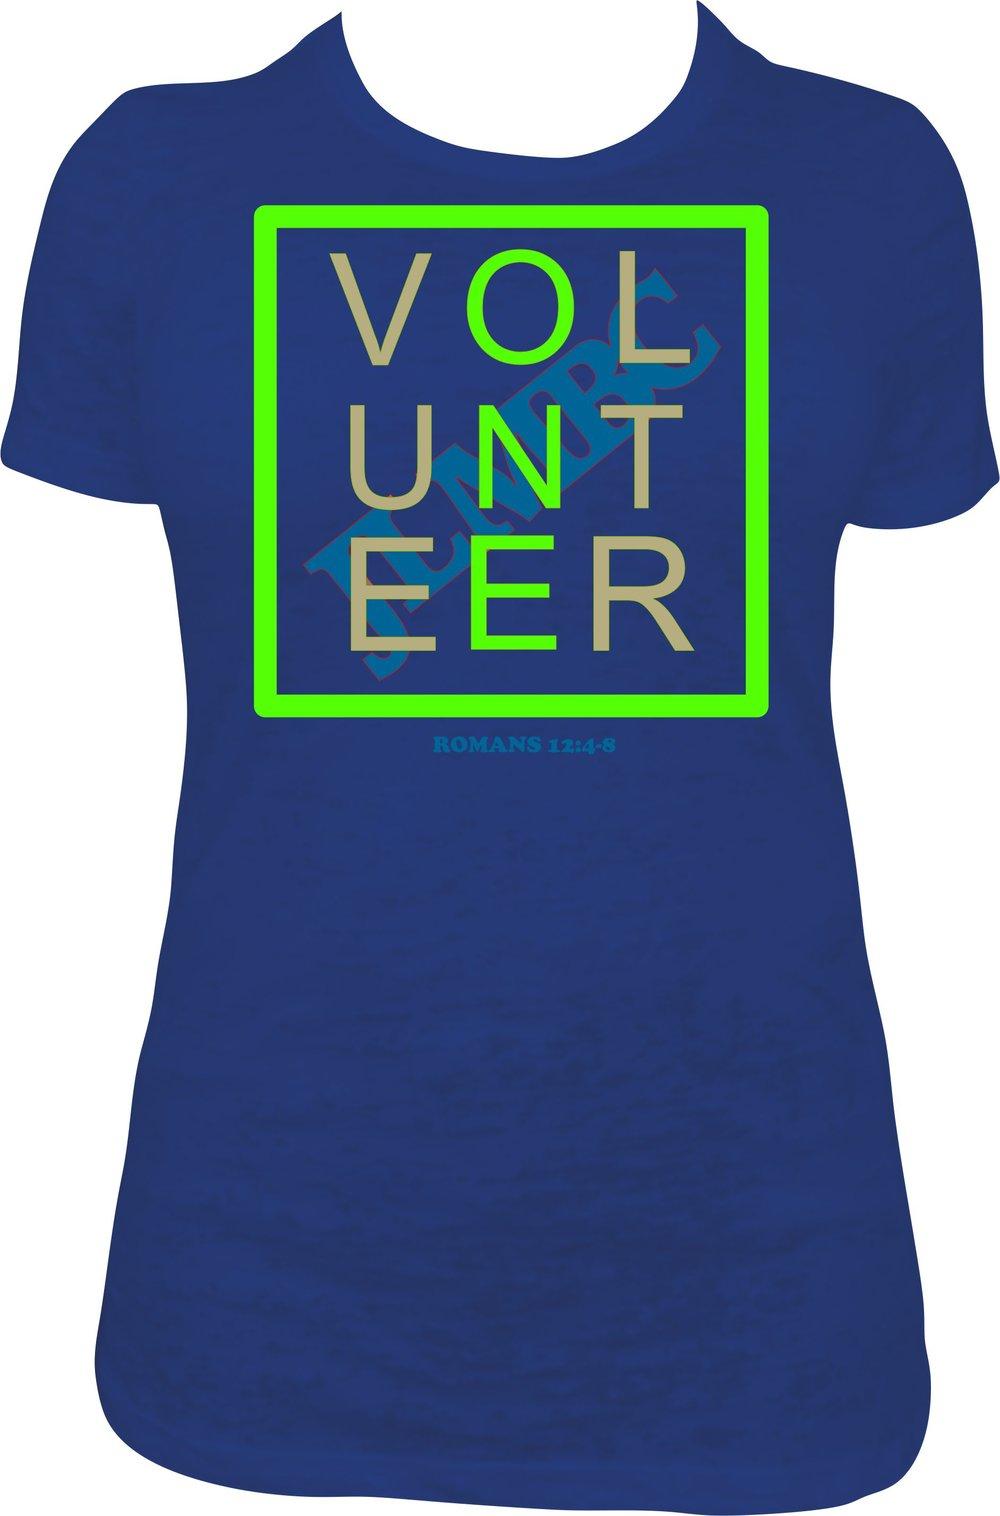 jlmbc volunteer.jpg